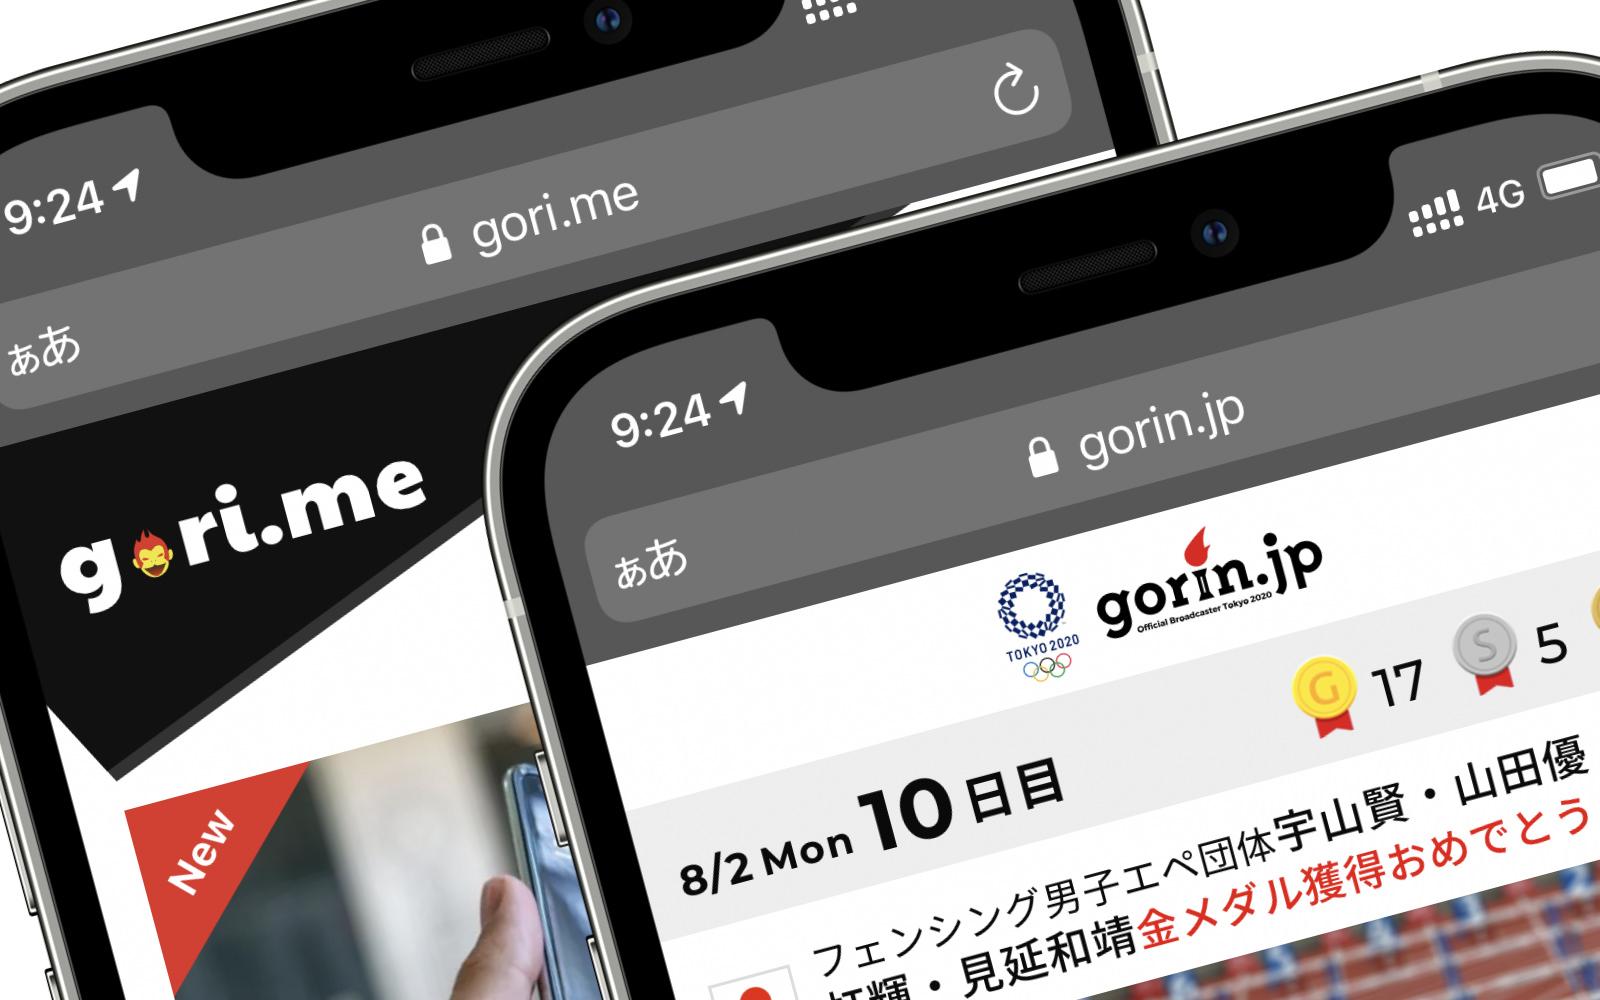 Gorime or gorinjp